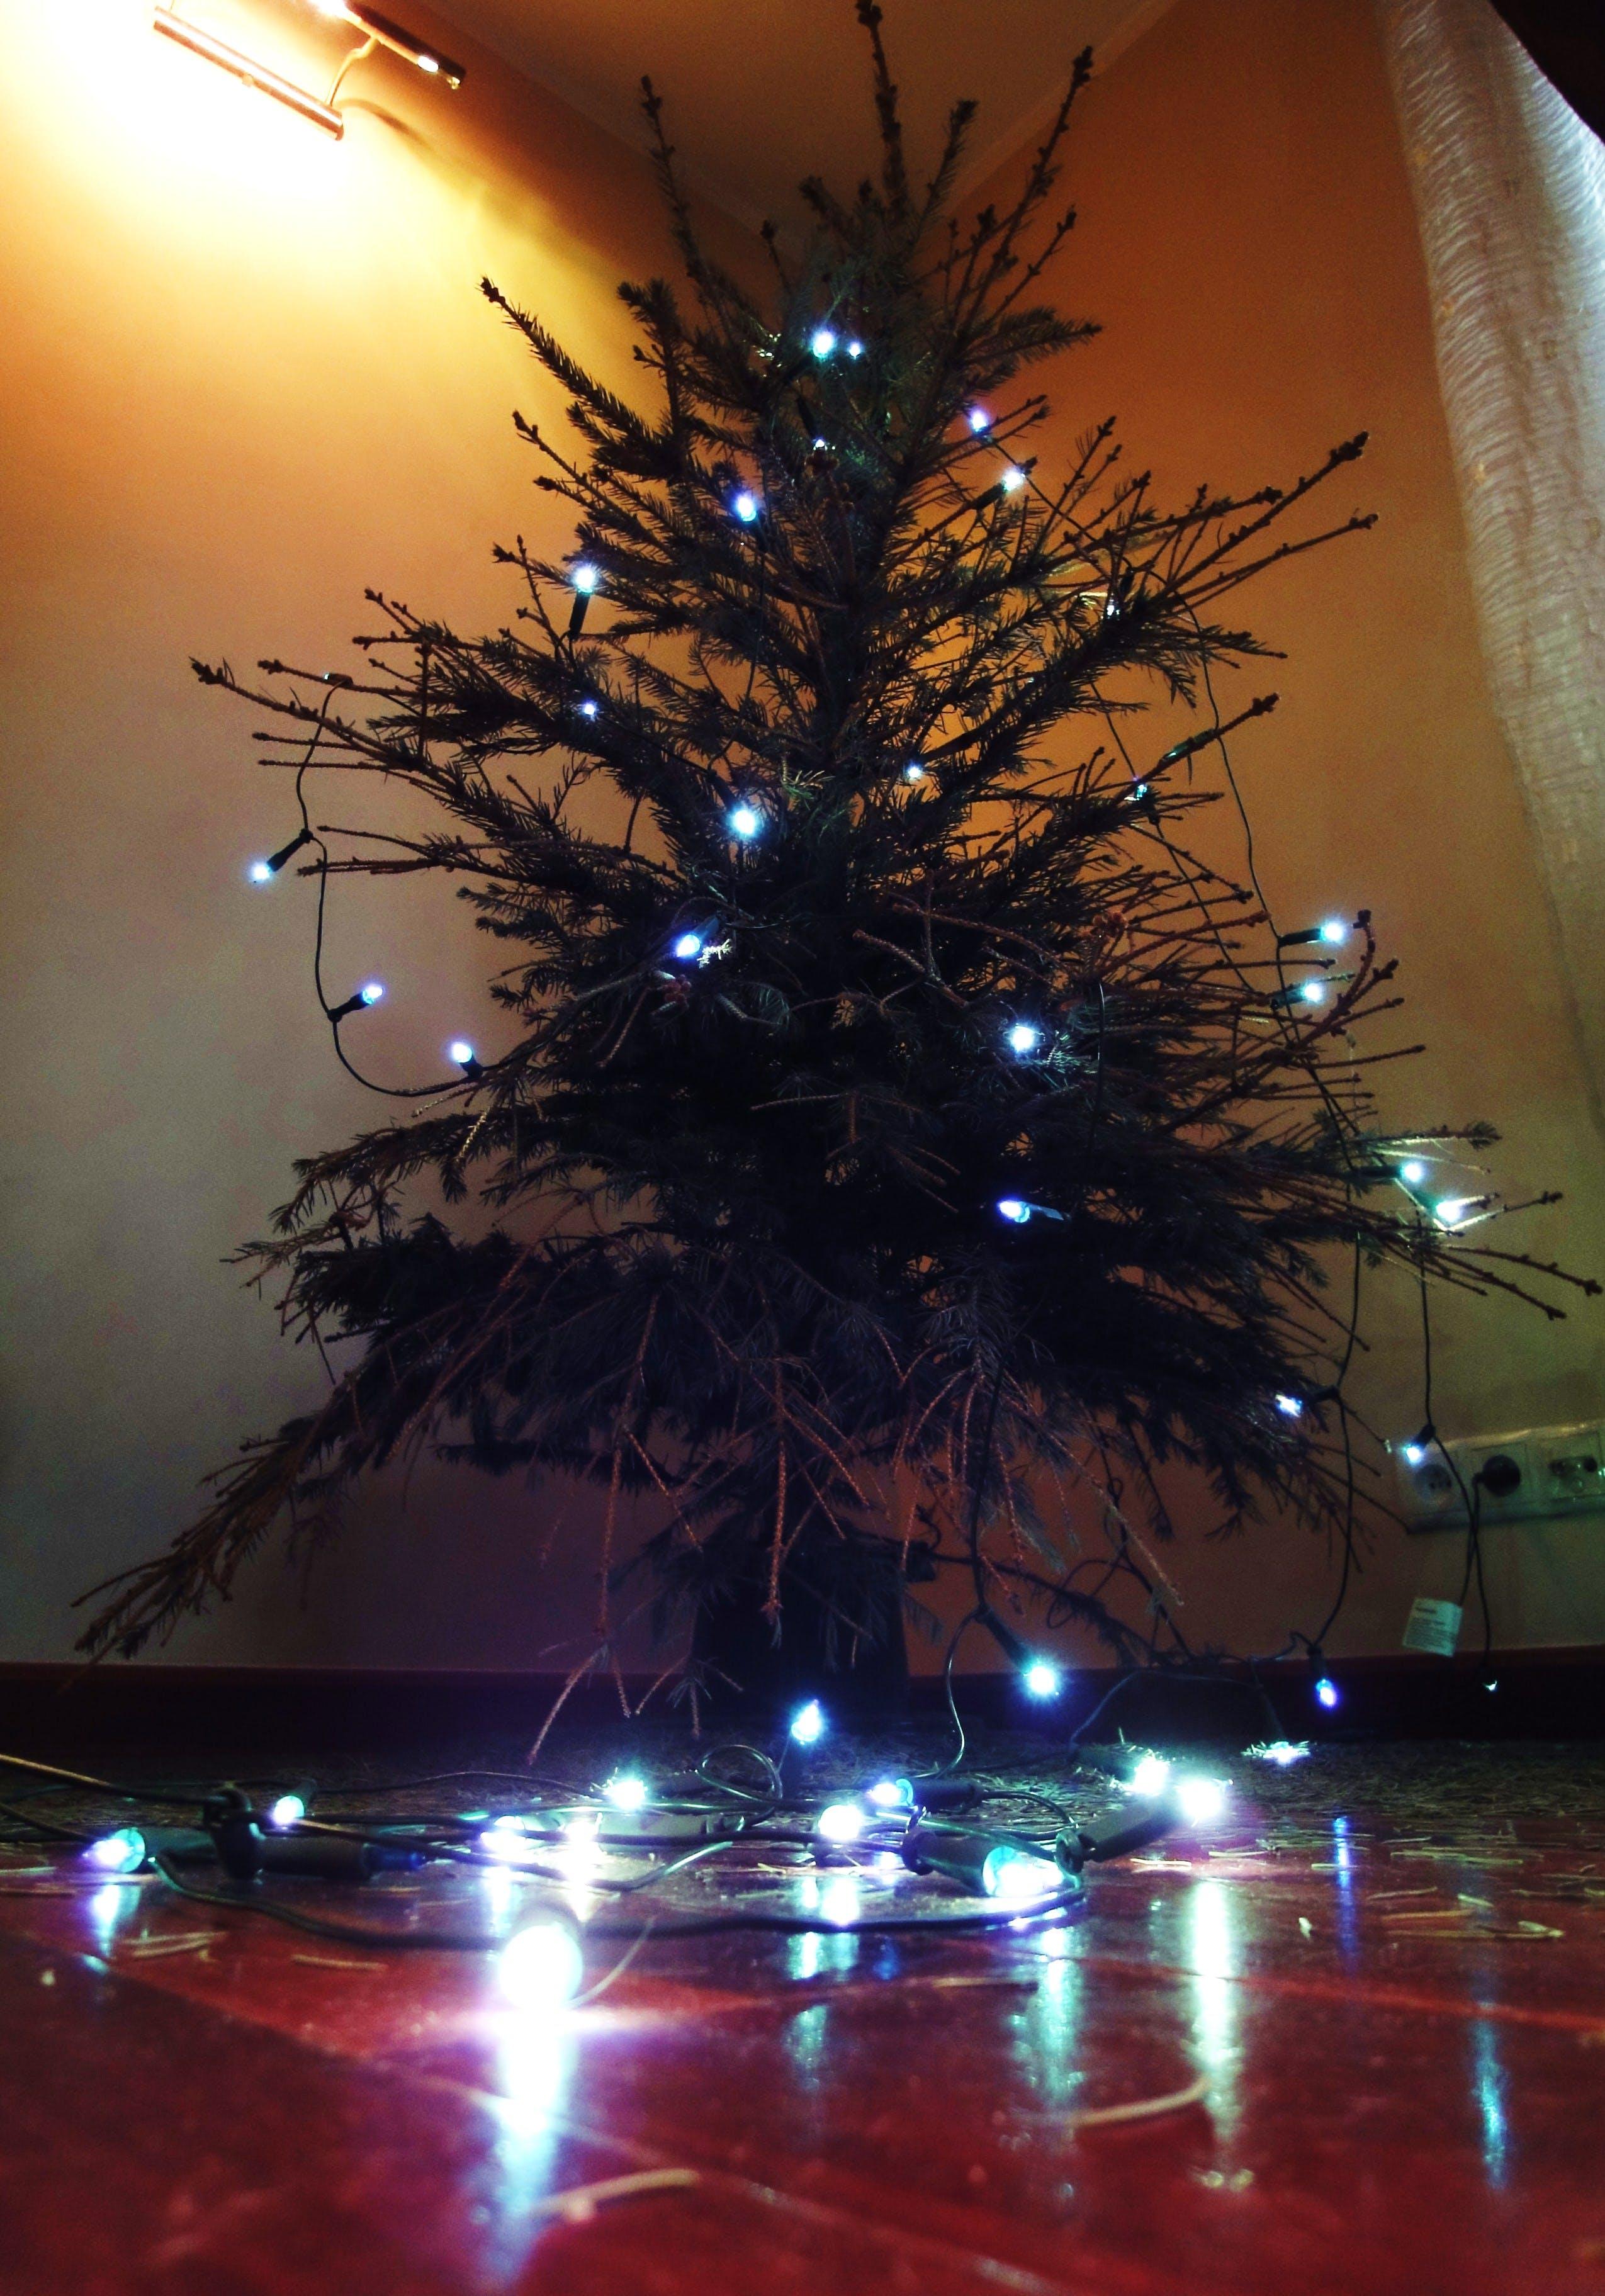 Free stock photo of christmas tree, lights, needle